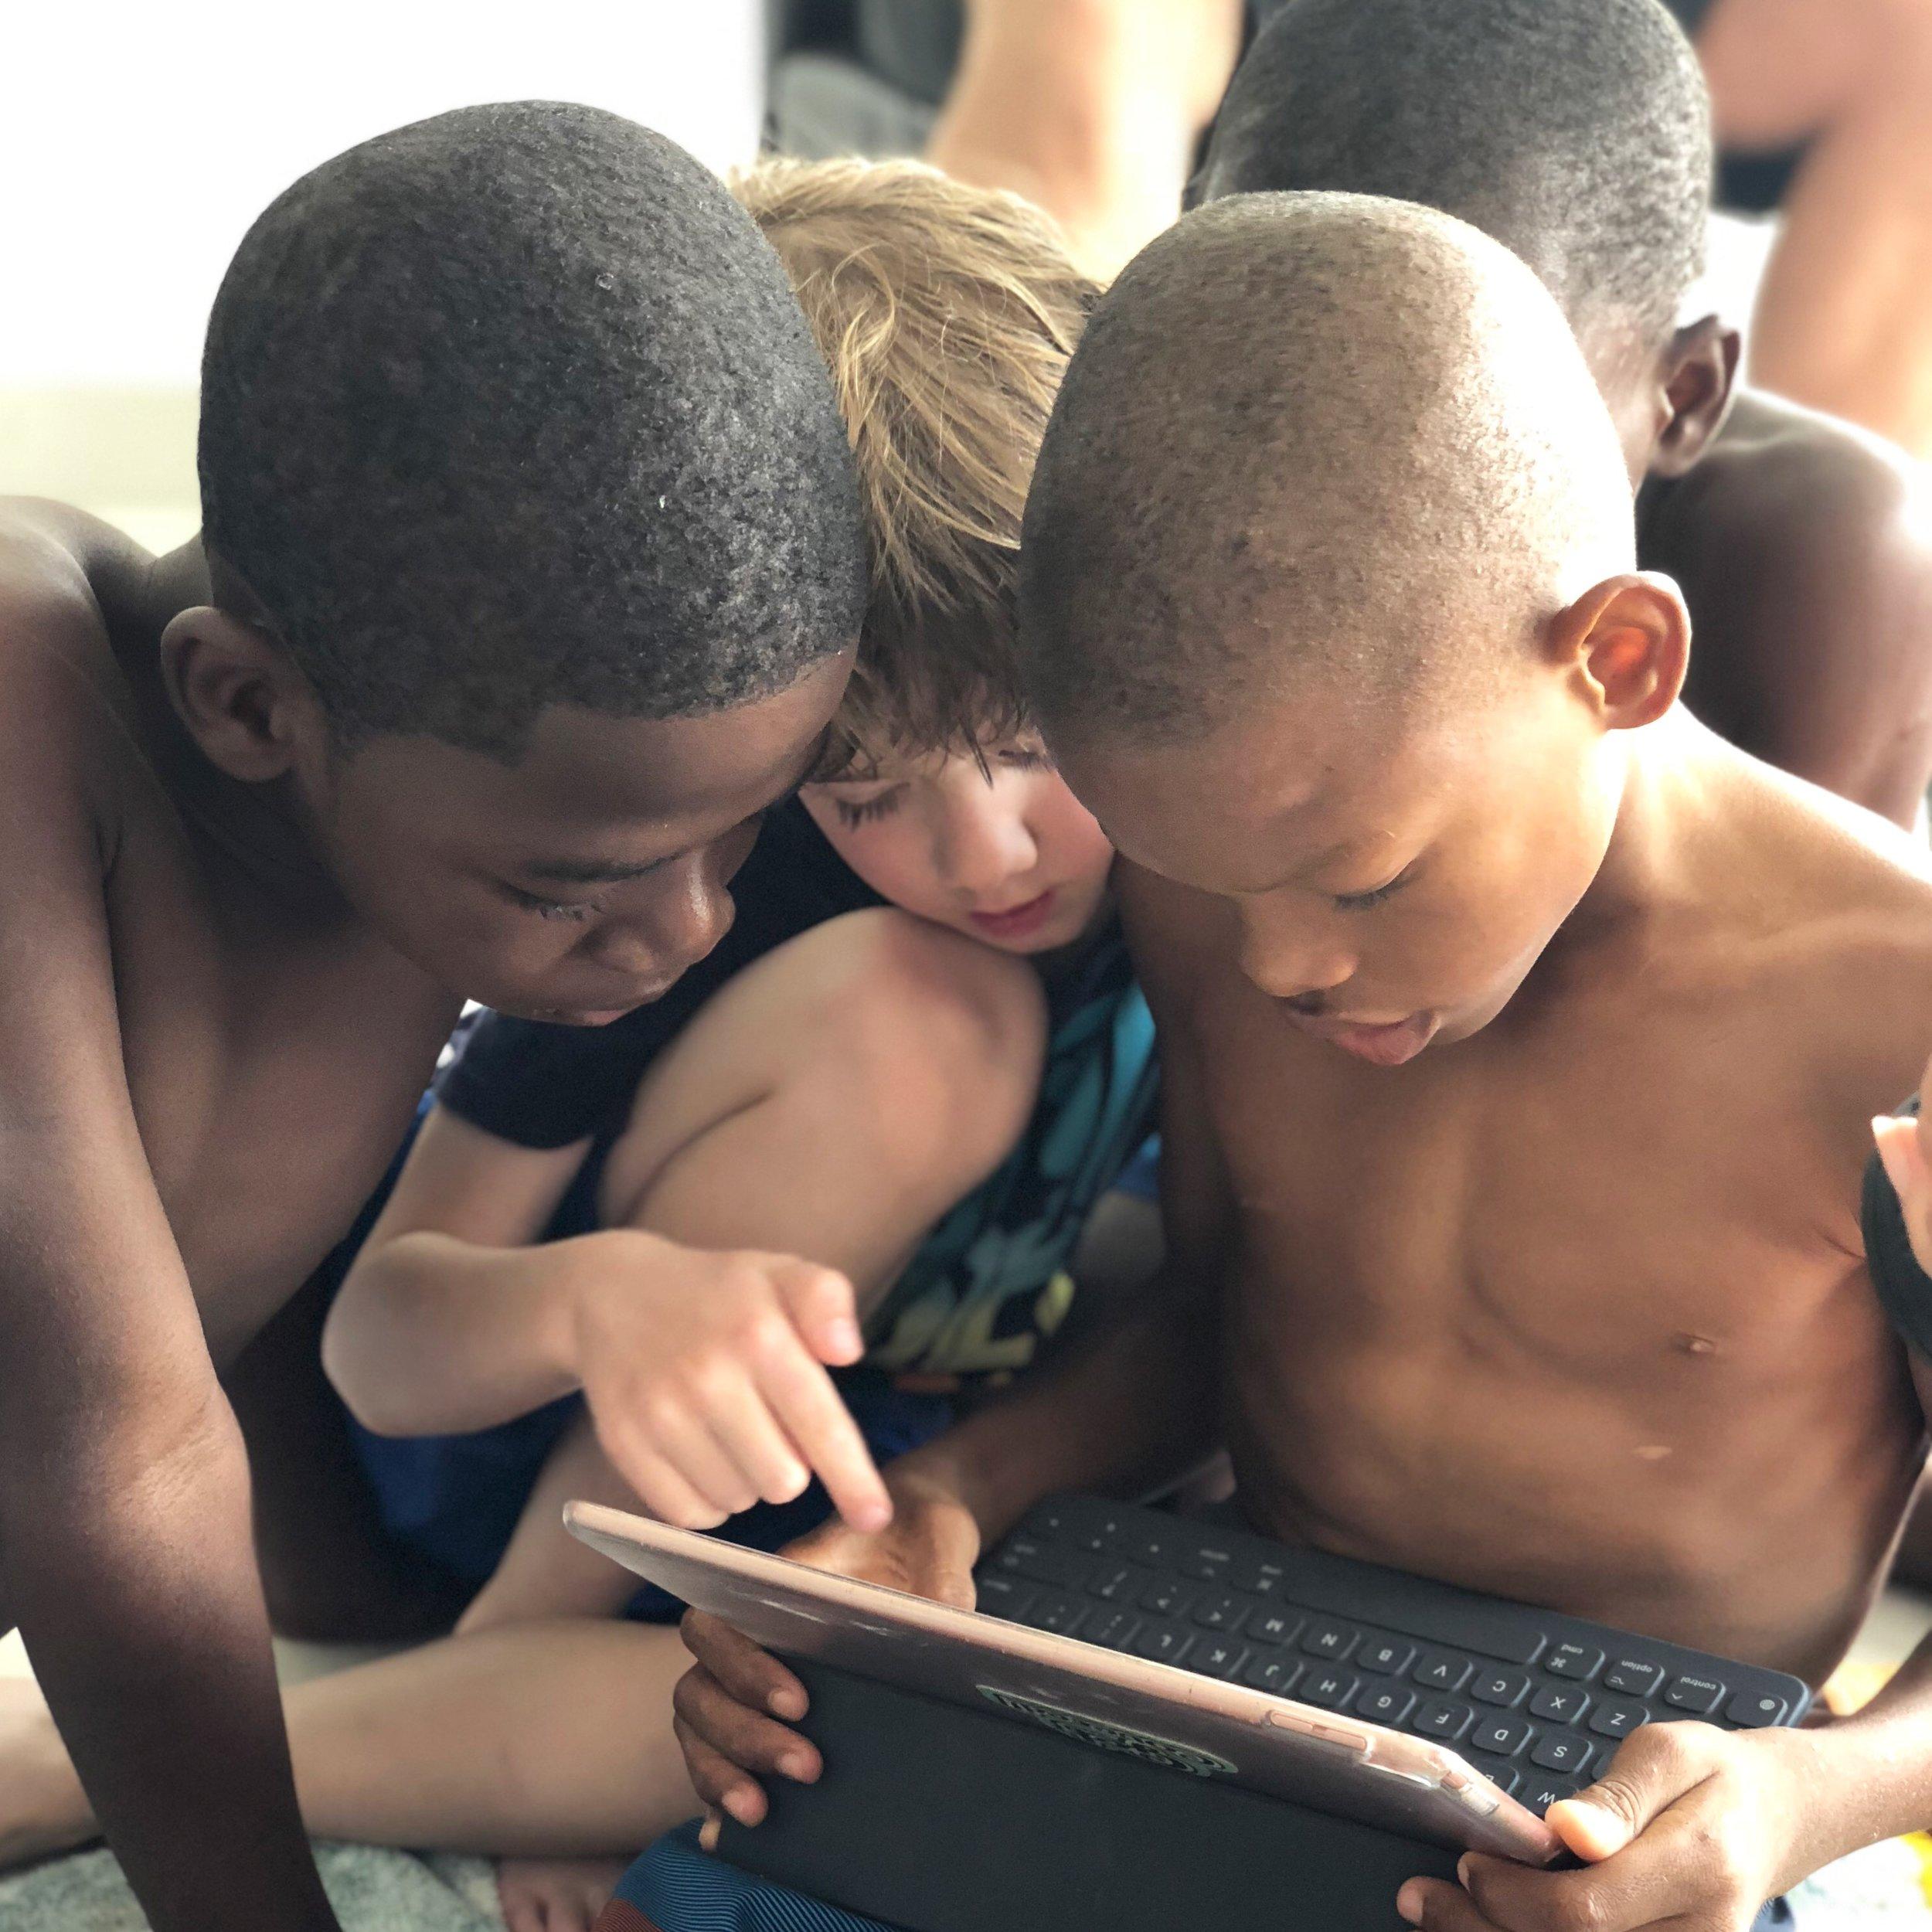 Haiti - Martell boys